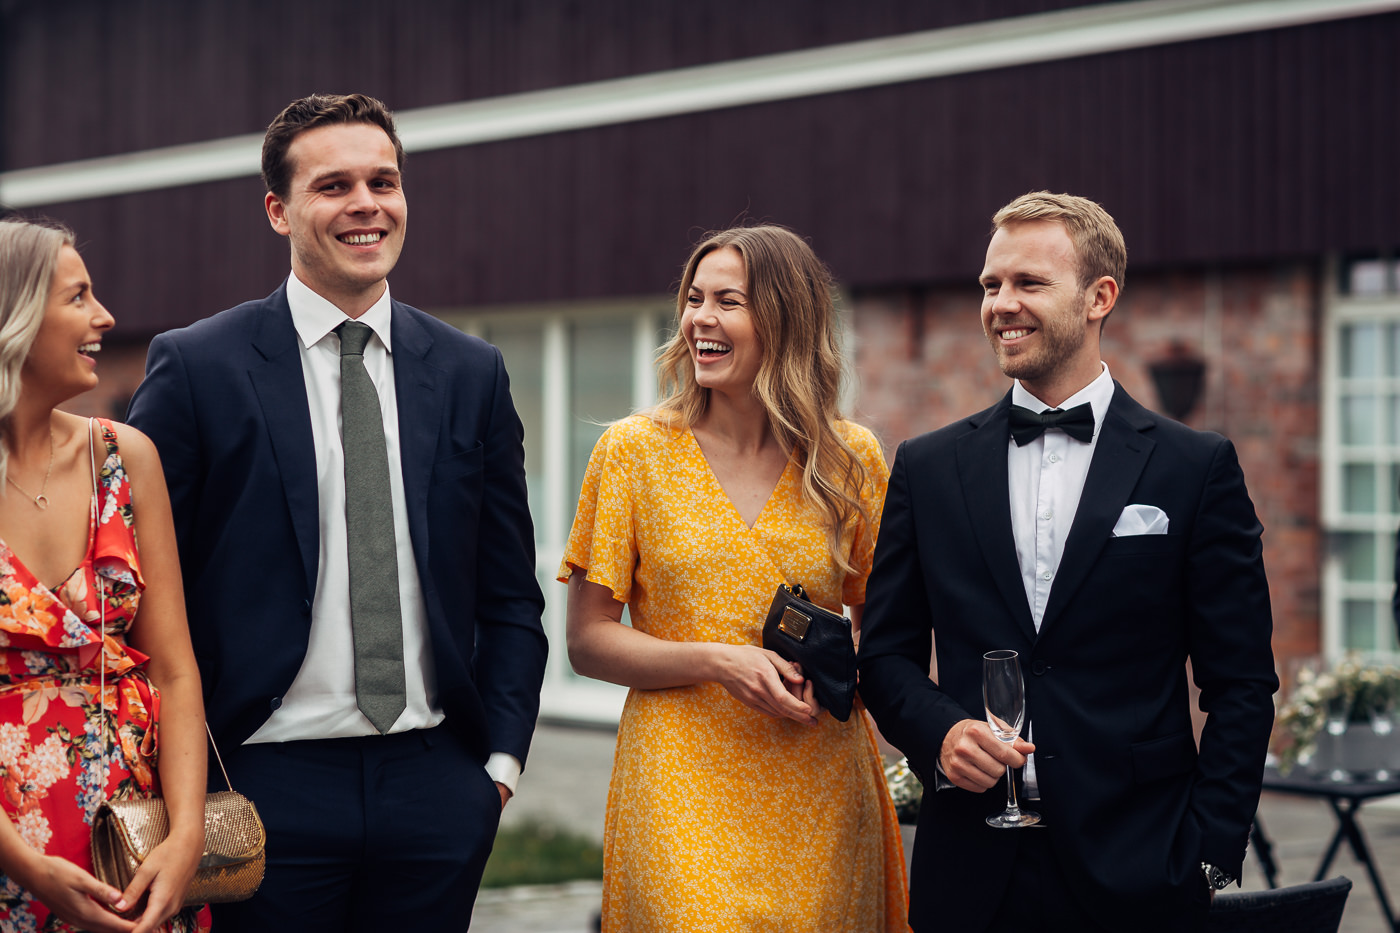 Malene & Ole Martin - elegant dansk- norskt bryllup i Oslo Bryllup Gamle Aker Oslo 24 Akershus